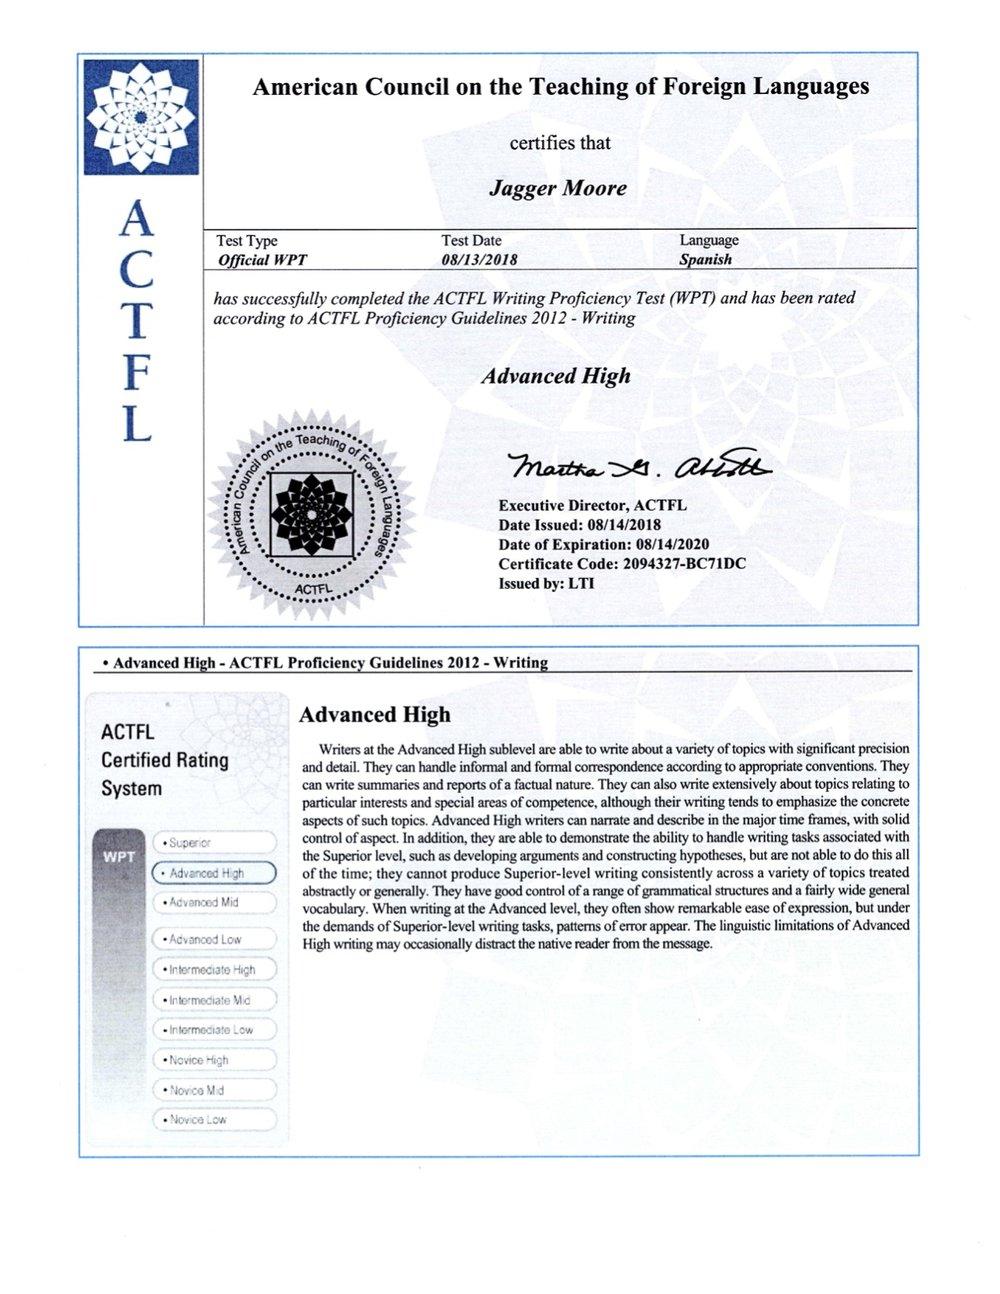 Spanish Certificate2.jpg